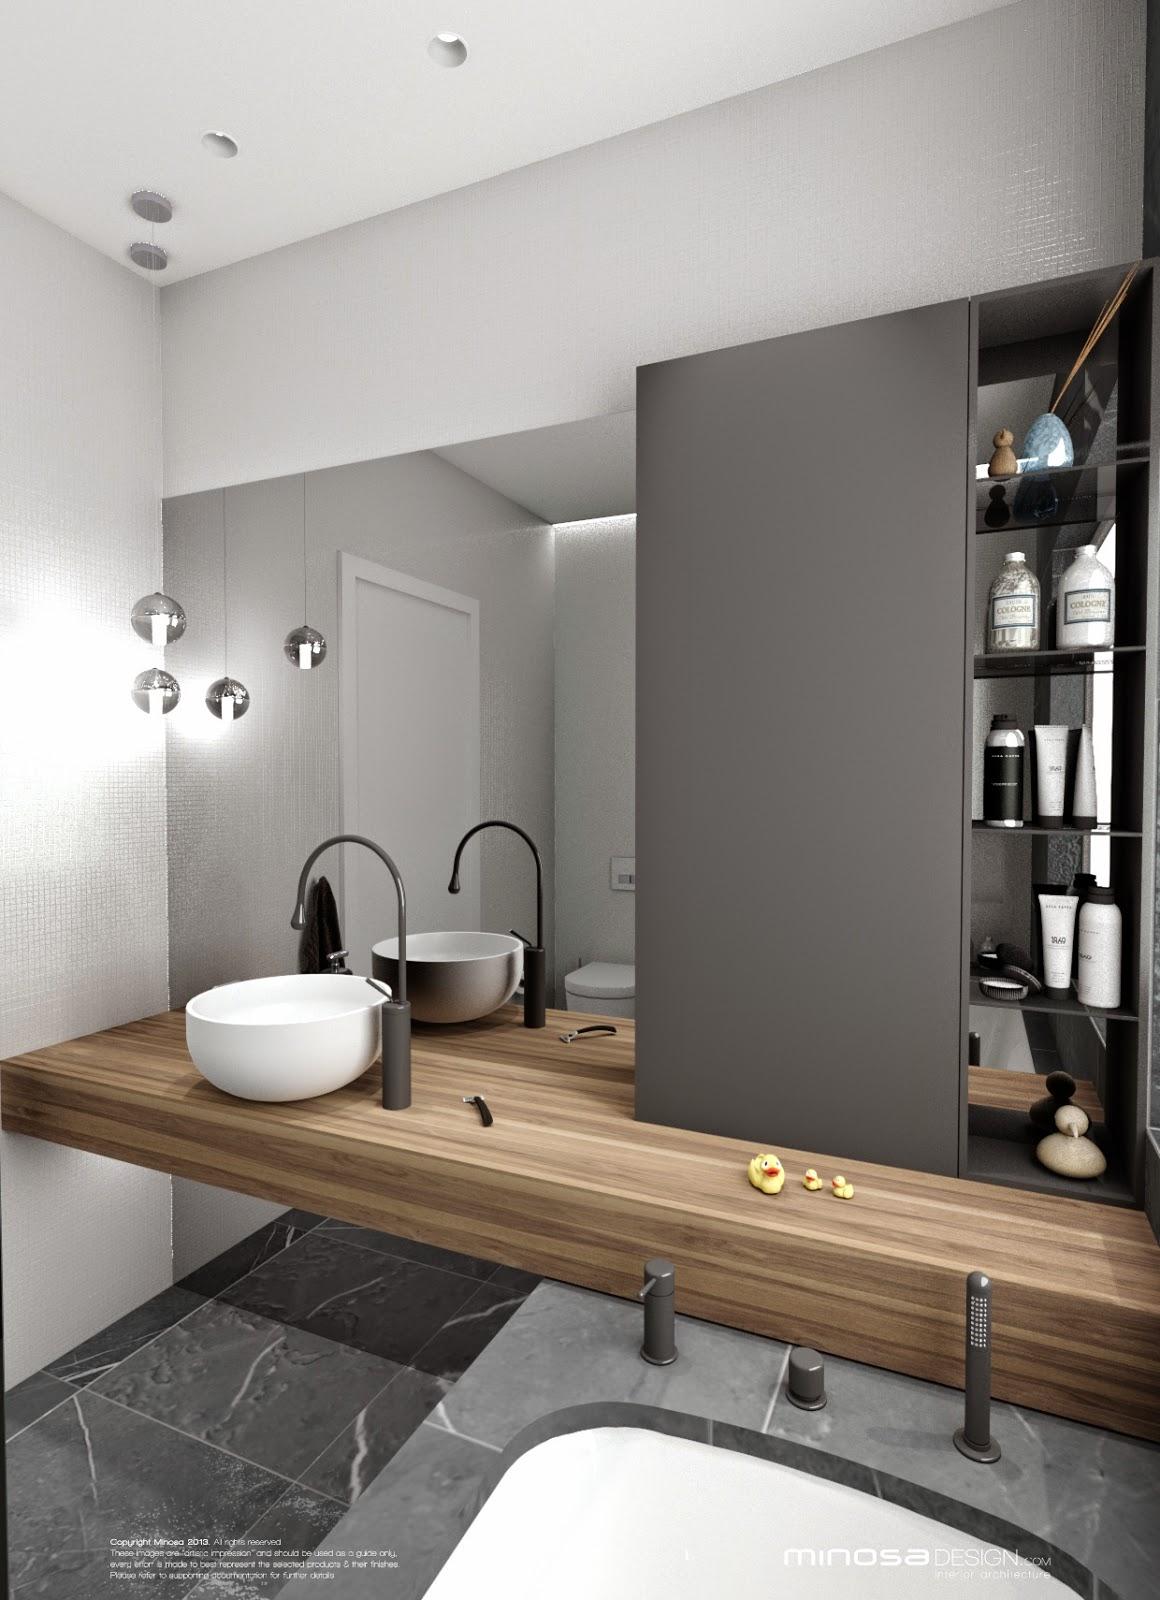 Minosa: Bathroom Design - Small space feels large